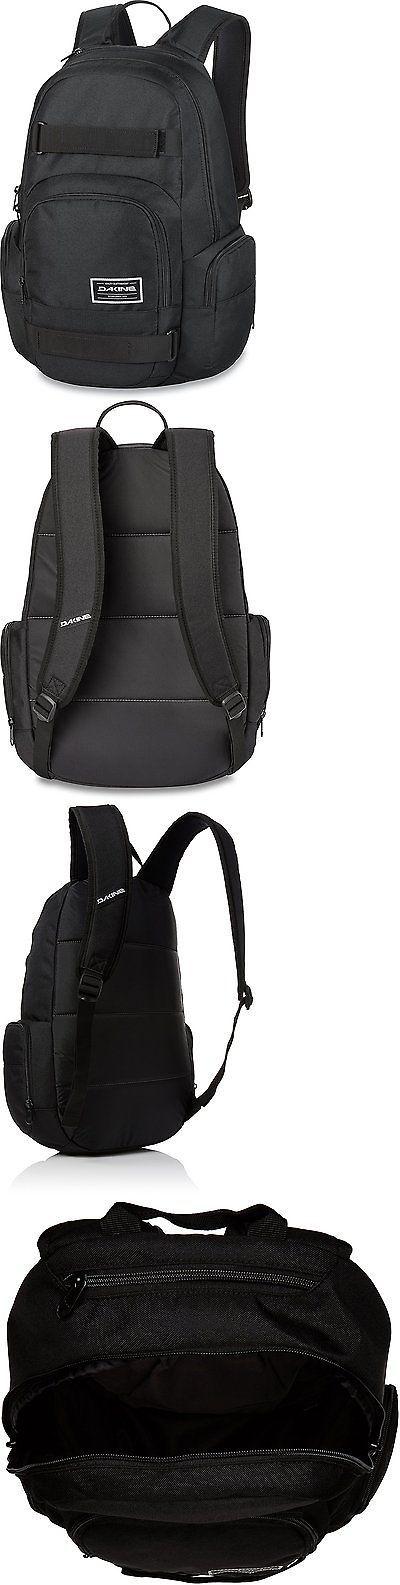 Other Skateboarding Clothing 159079: Dakine Atlas Backpack, Black, One Size 25 L -> BUY IT NOW ONLY: $47.36 on eBay!